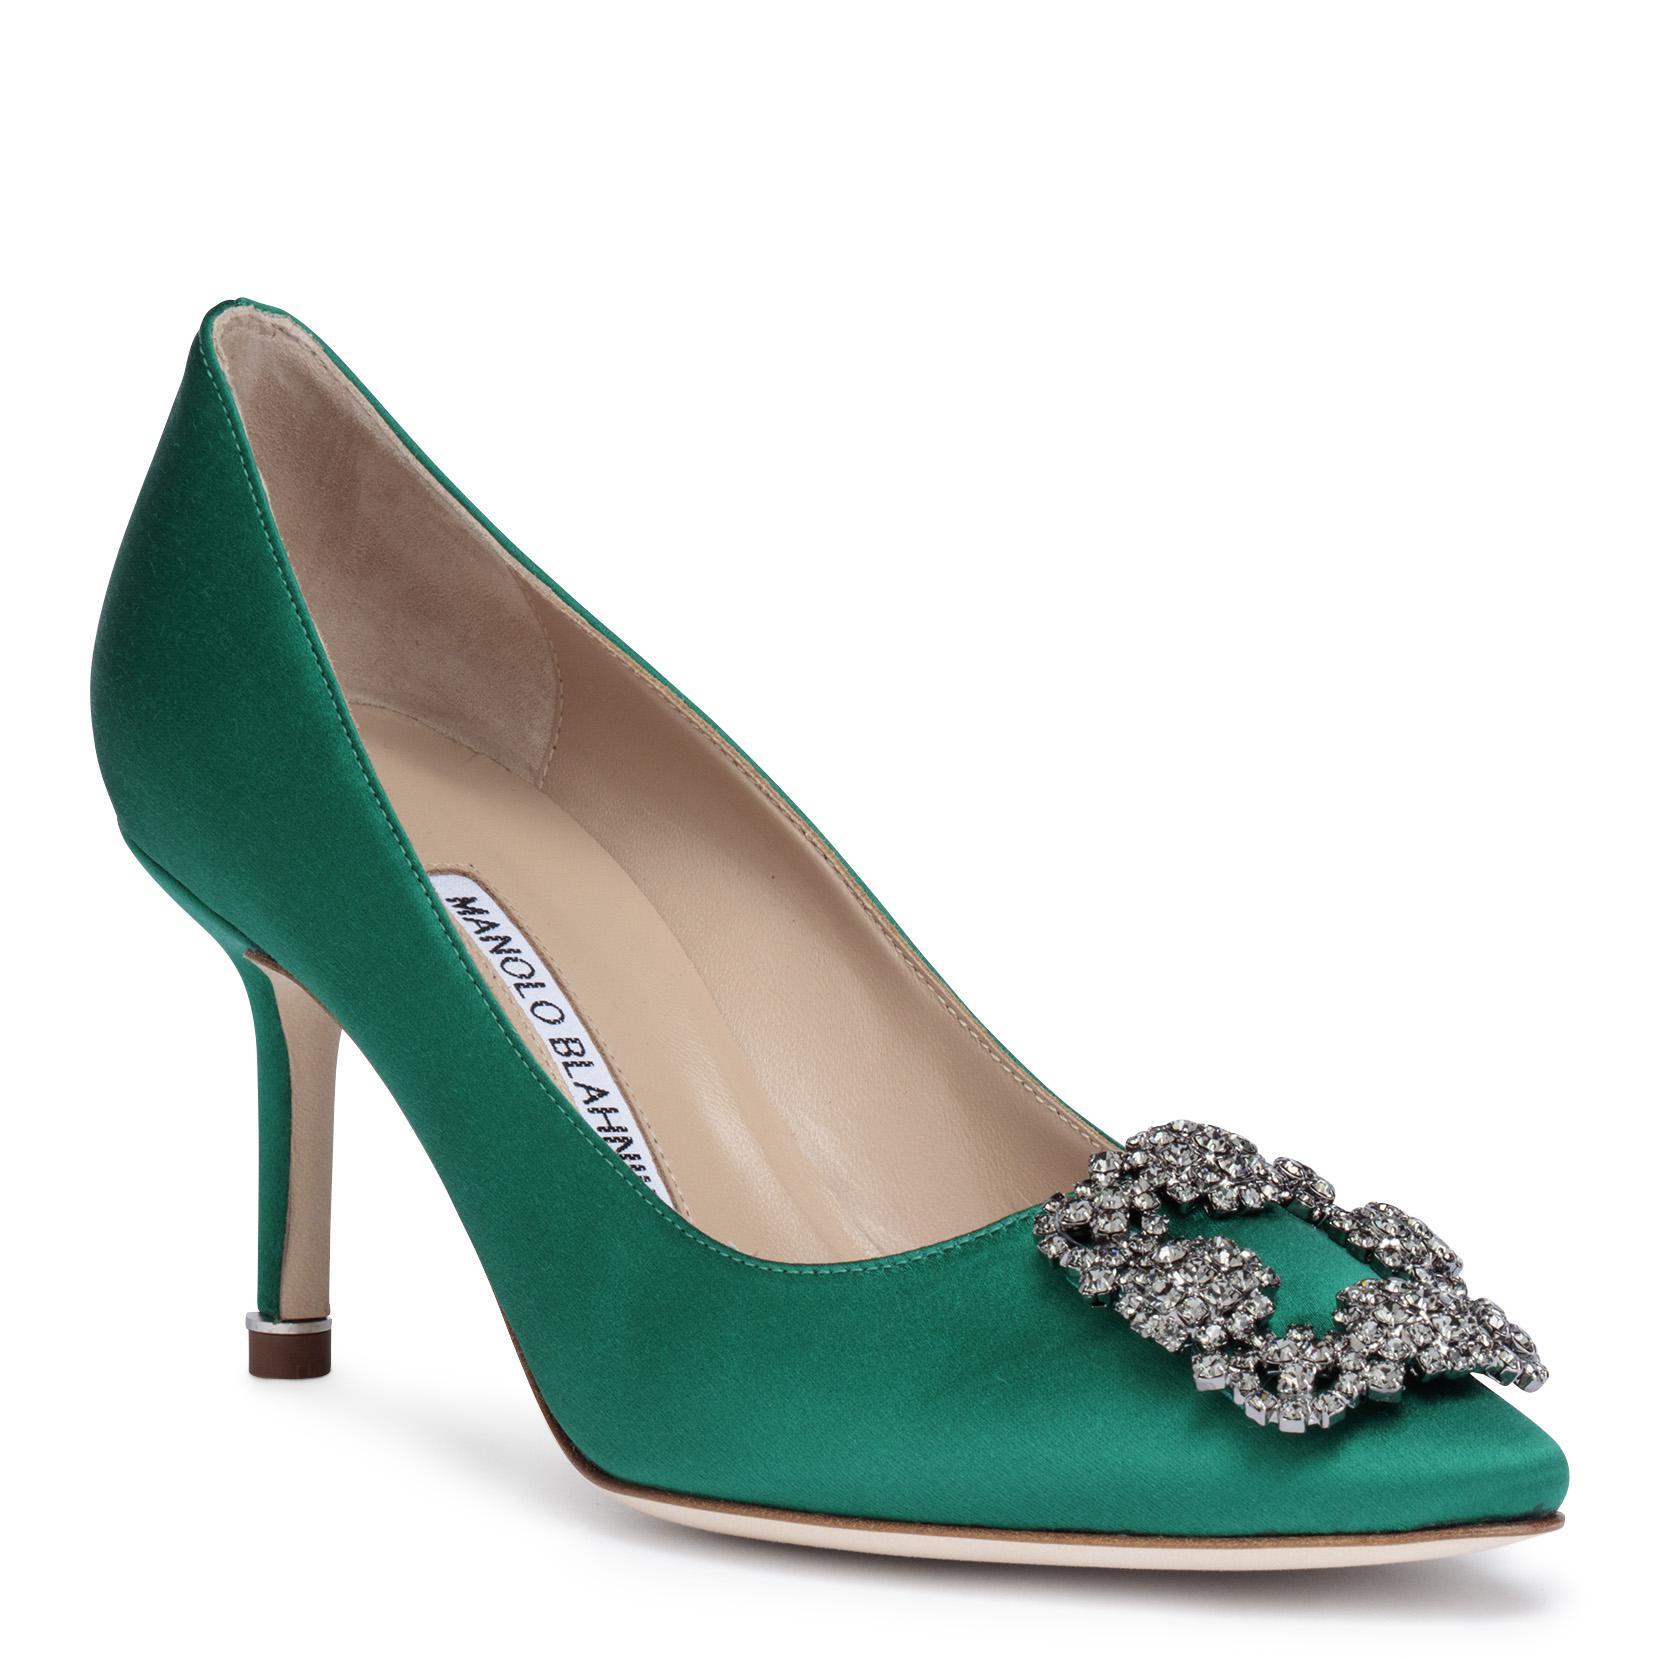 Professional Cheap Price Hangisi 70 emerald satin pumps Manolo Blahnik Discount Best Sale Cheap Price Free Shipping Free Shipping Best Sale n1fWPND6